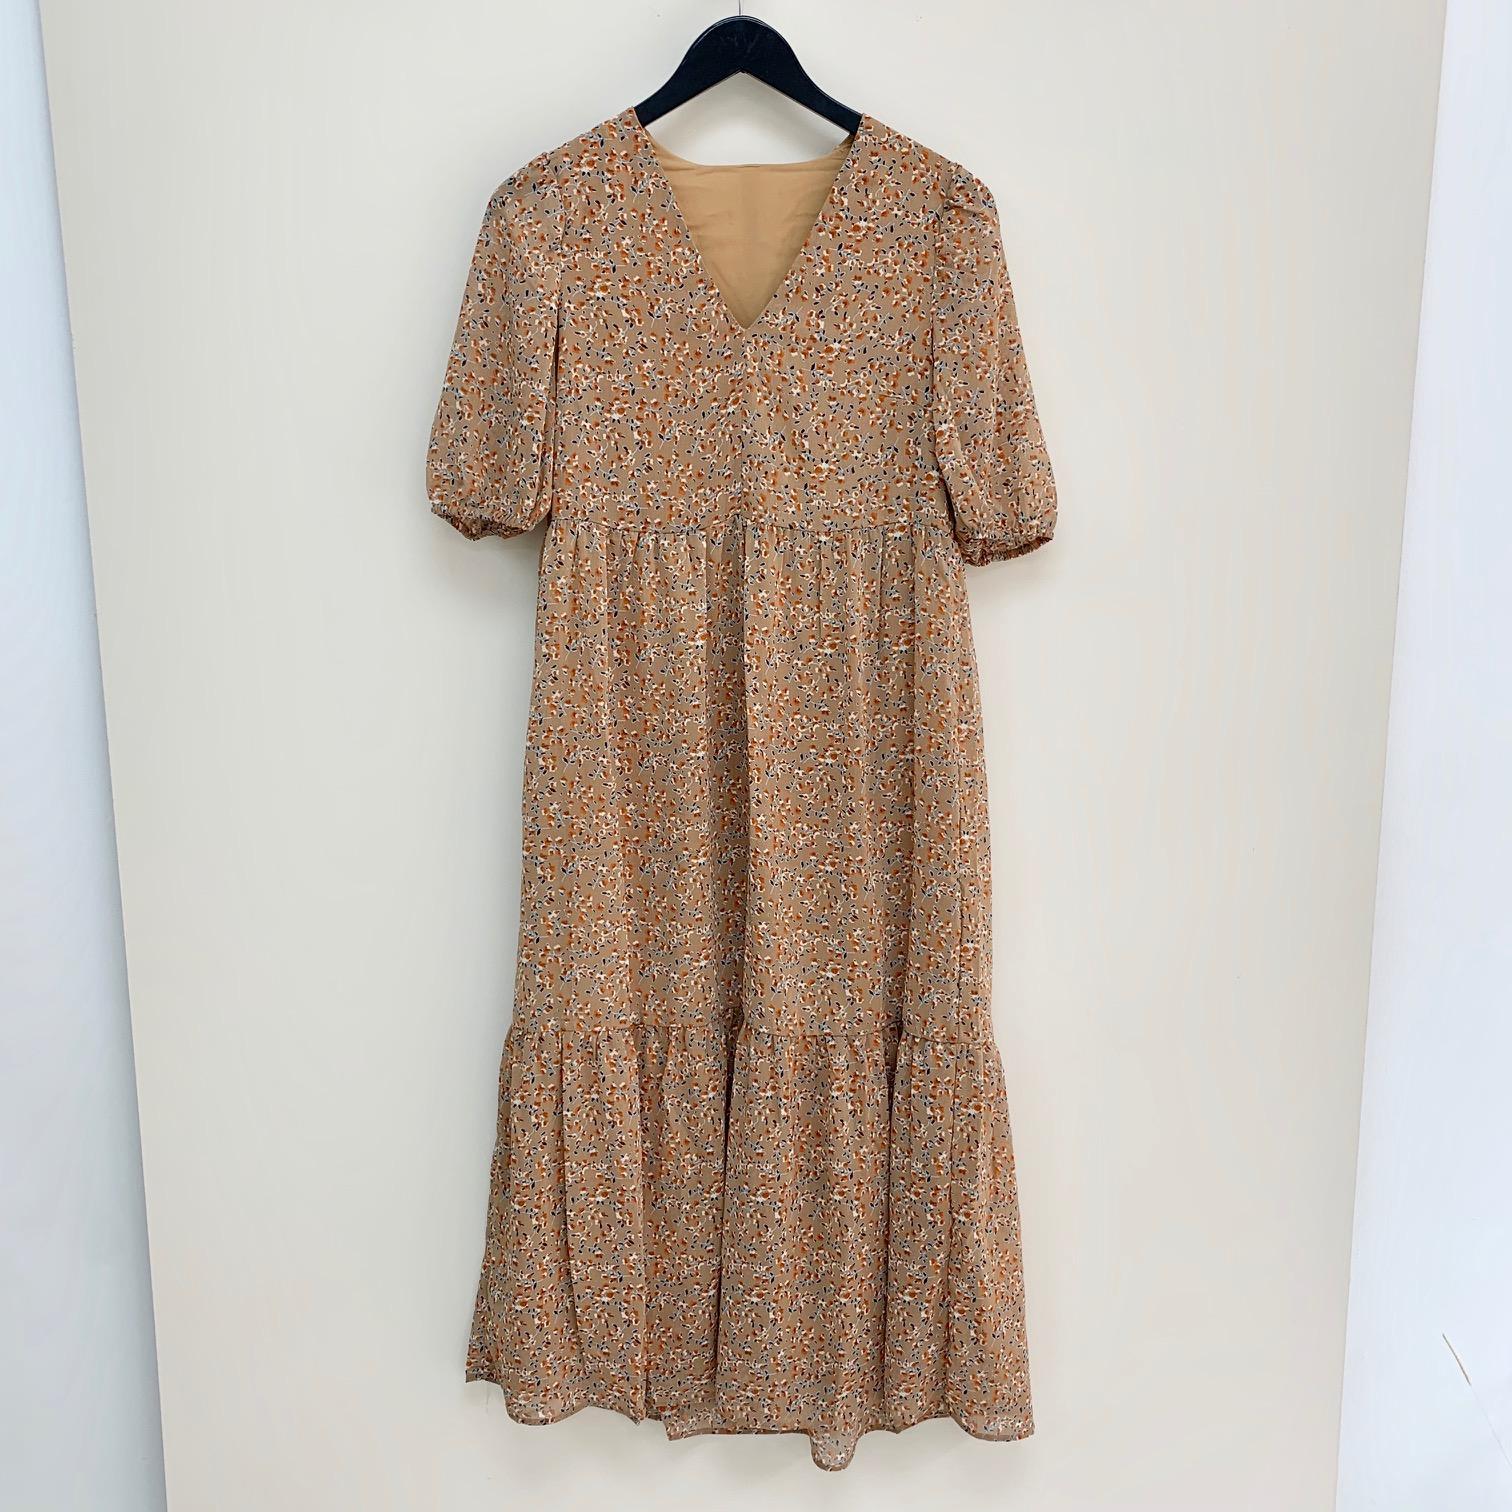 SALE Anemone Smock Midi Dress was £65.00